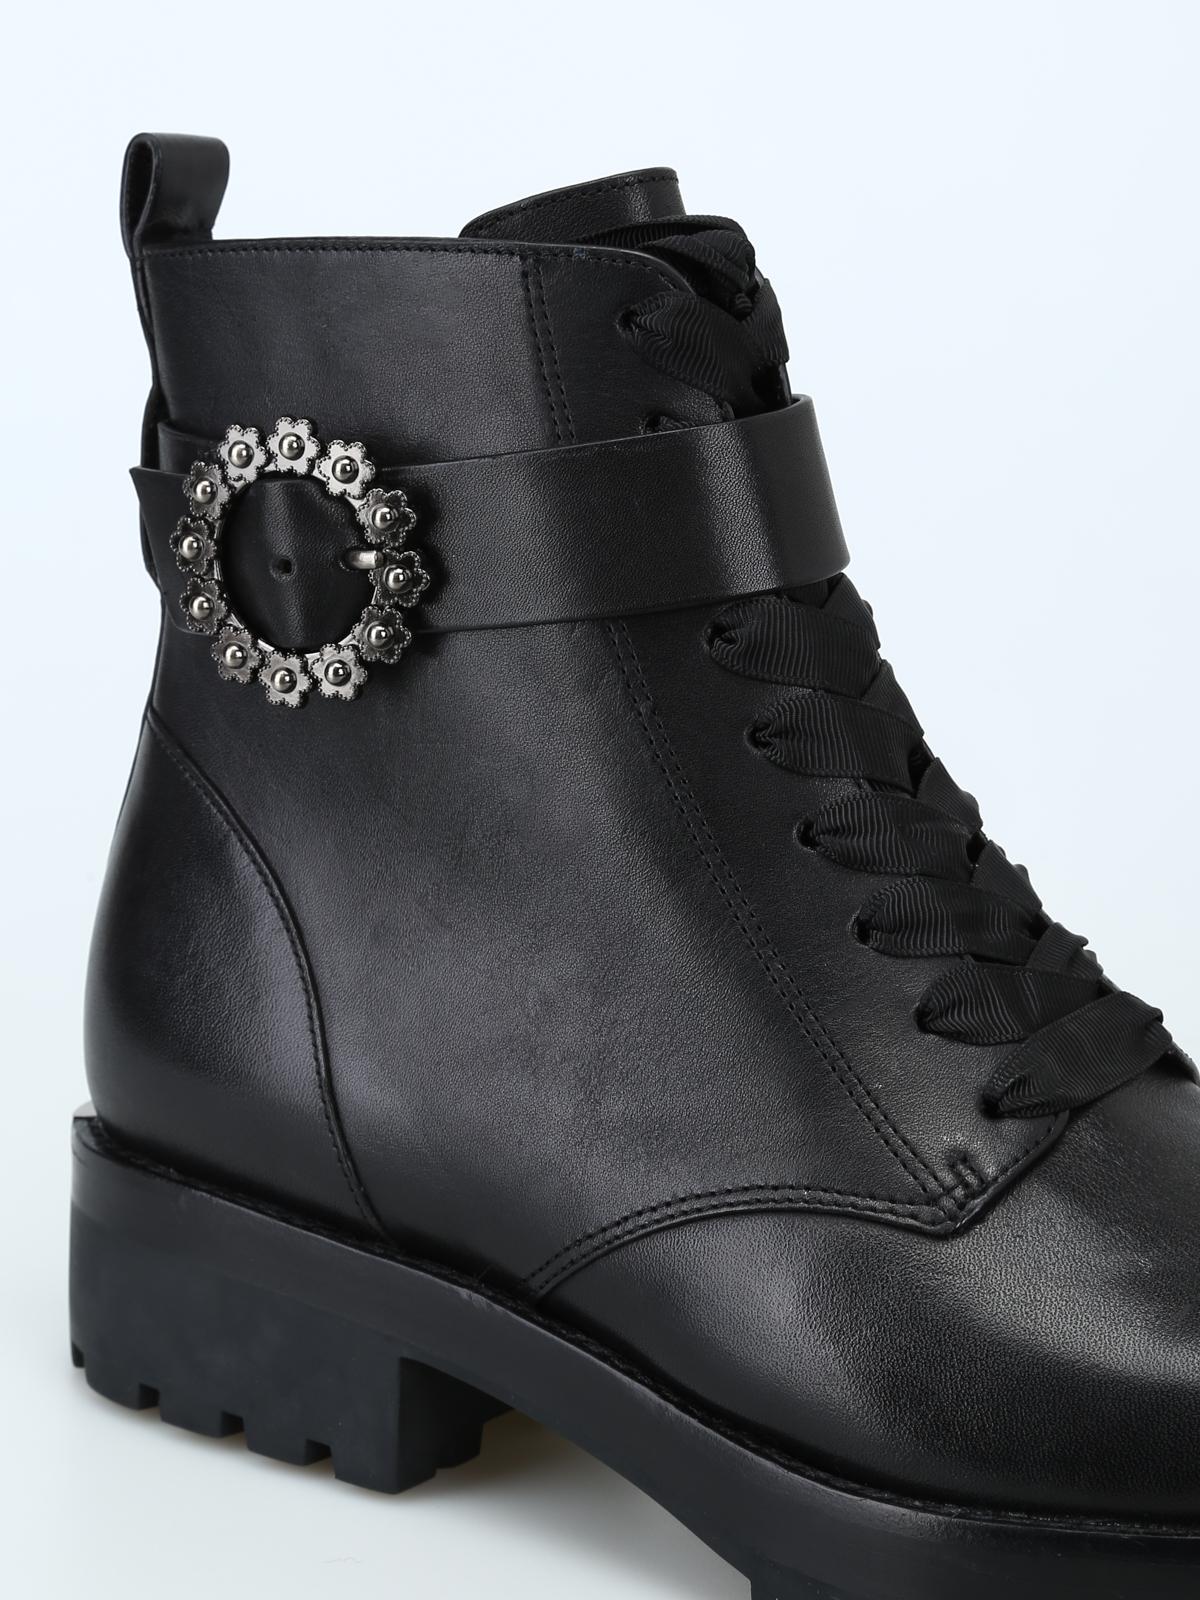 Michael Kors - Ryder leather ankle